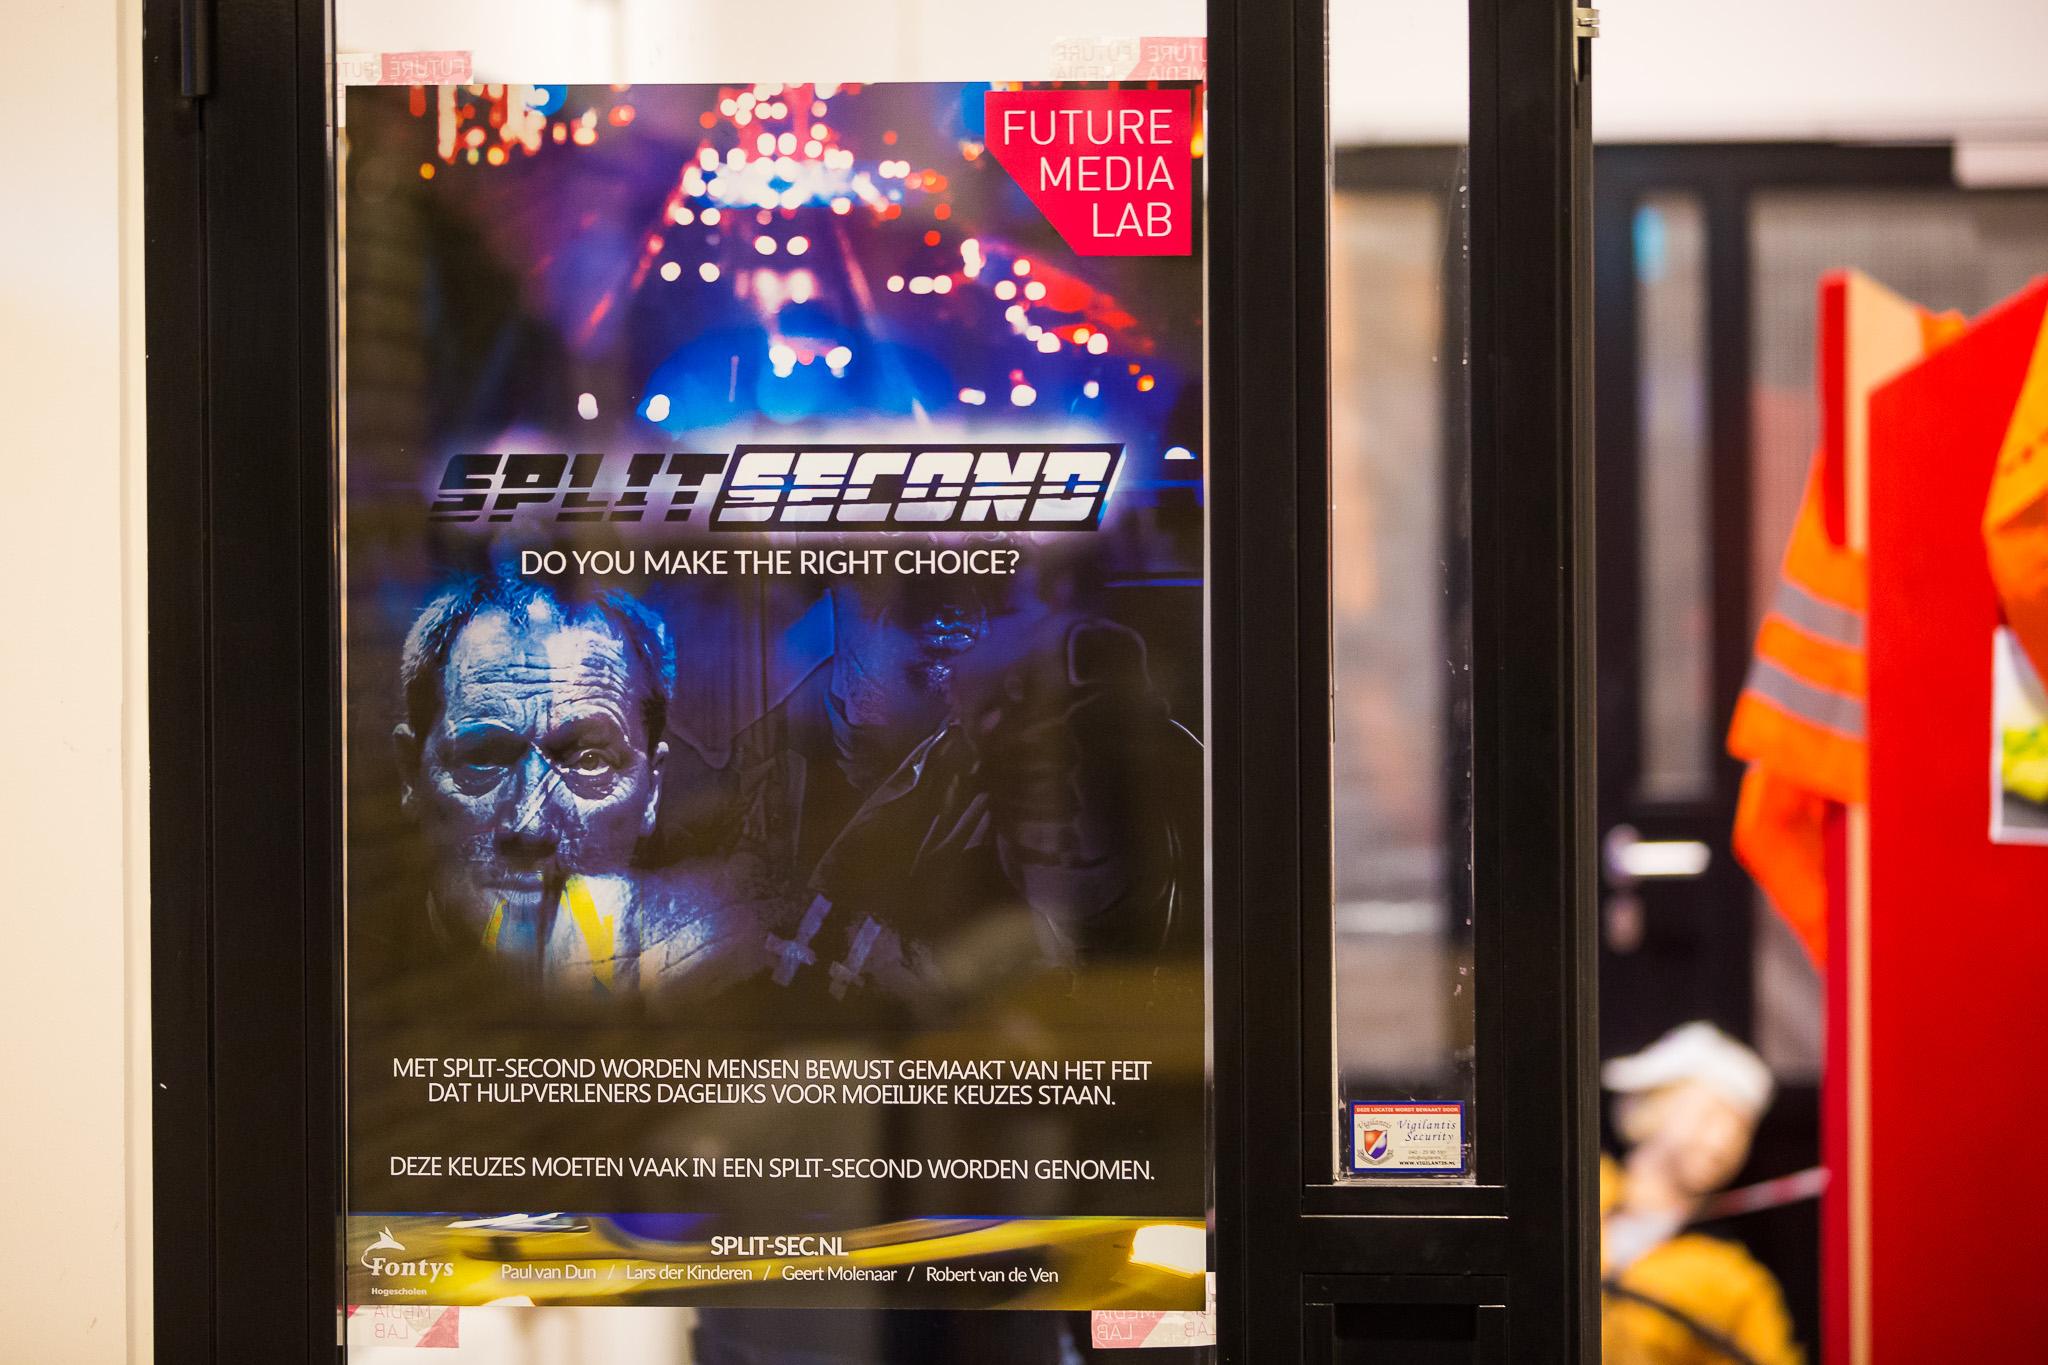 TD-20160121-FutureMediaLab-232-8085